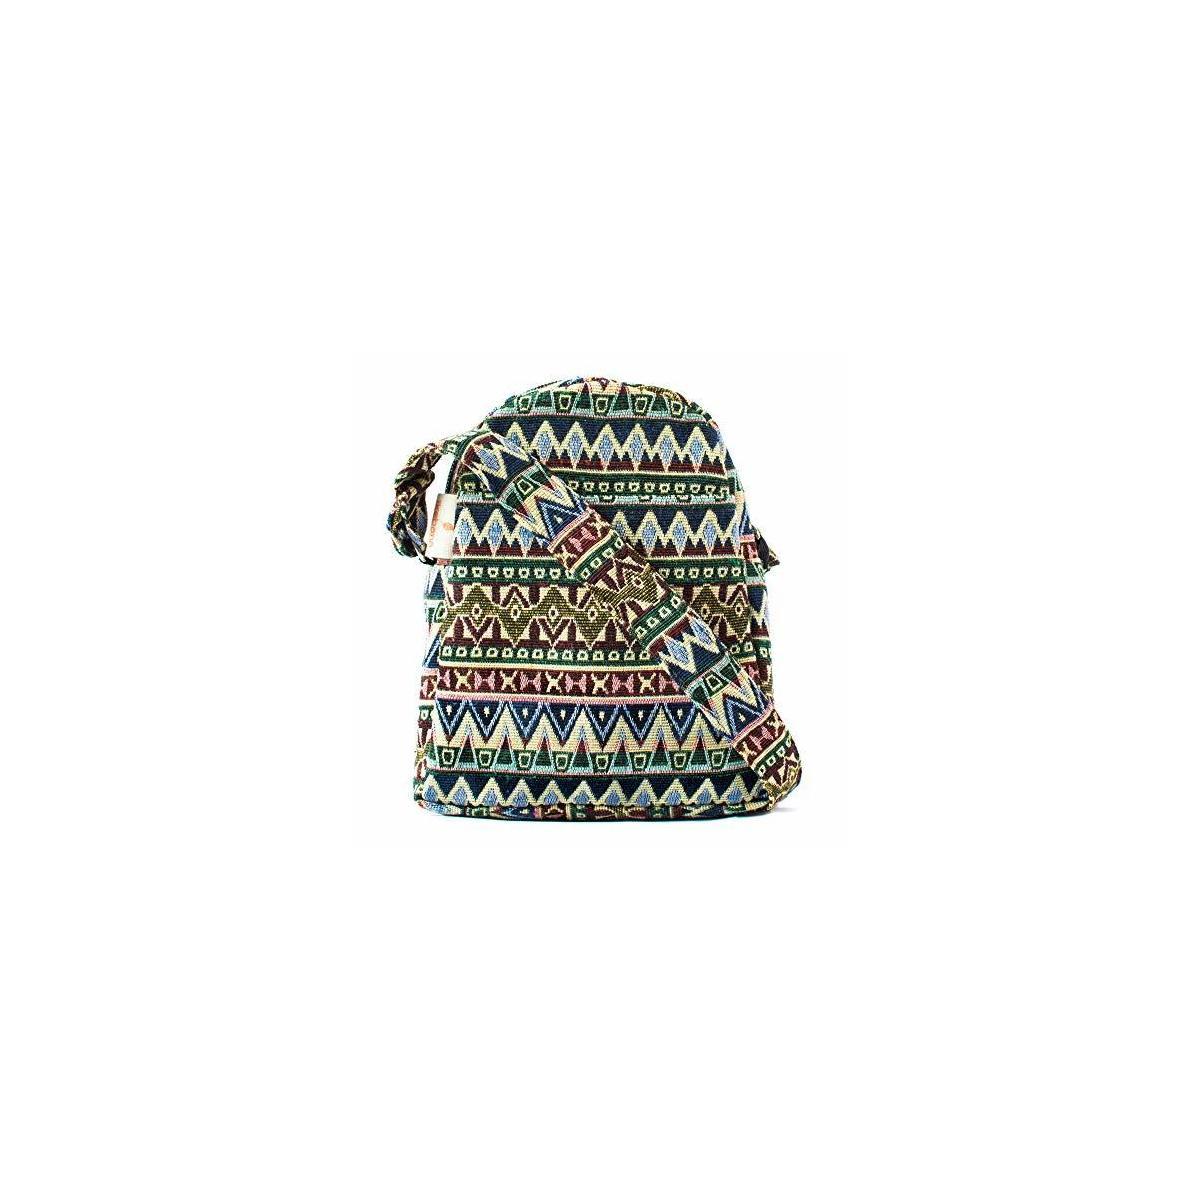 Ikebana Handmade Crossbody Bags for Women Brocade Purse Cell Phone and Travel